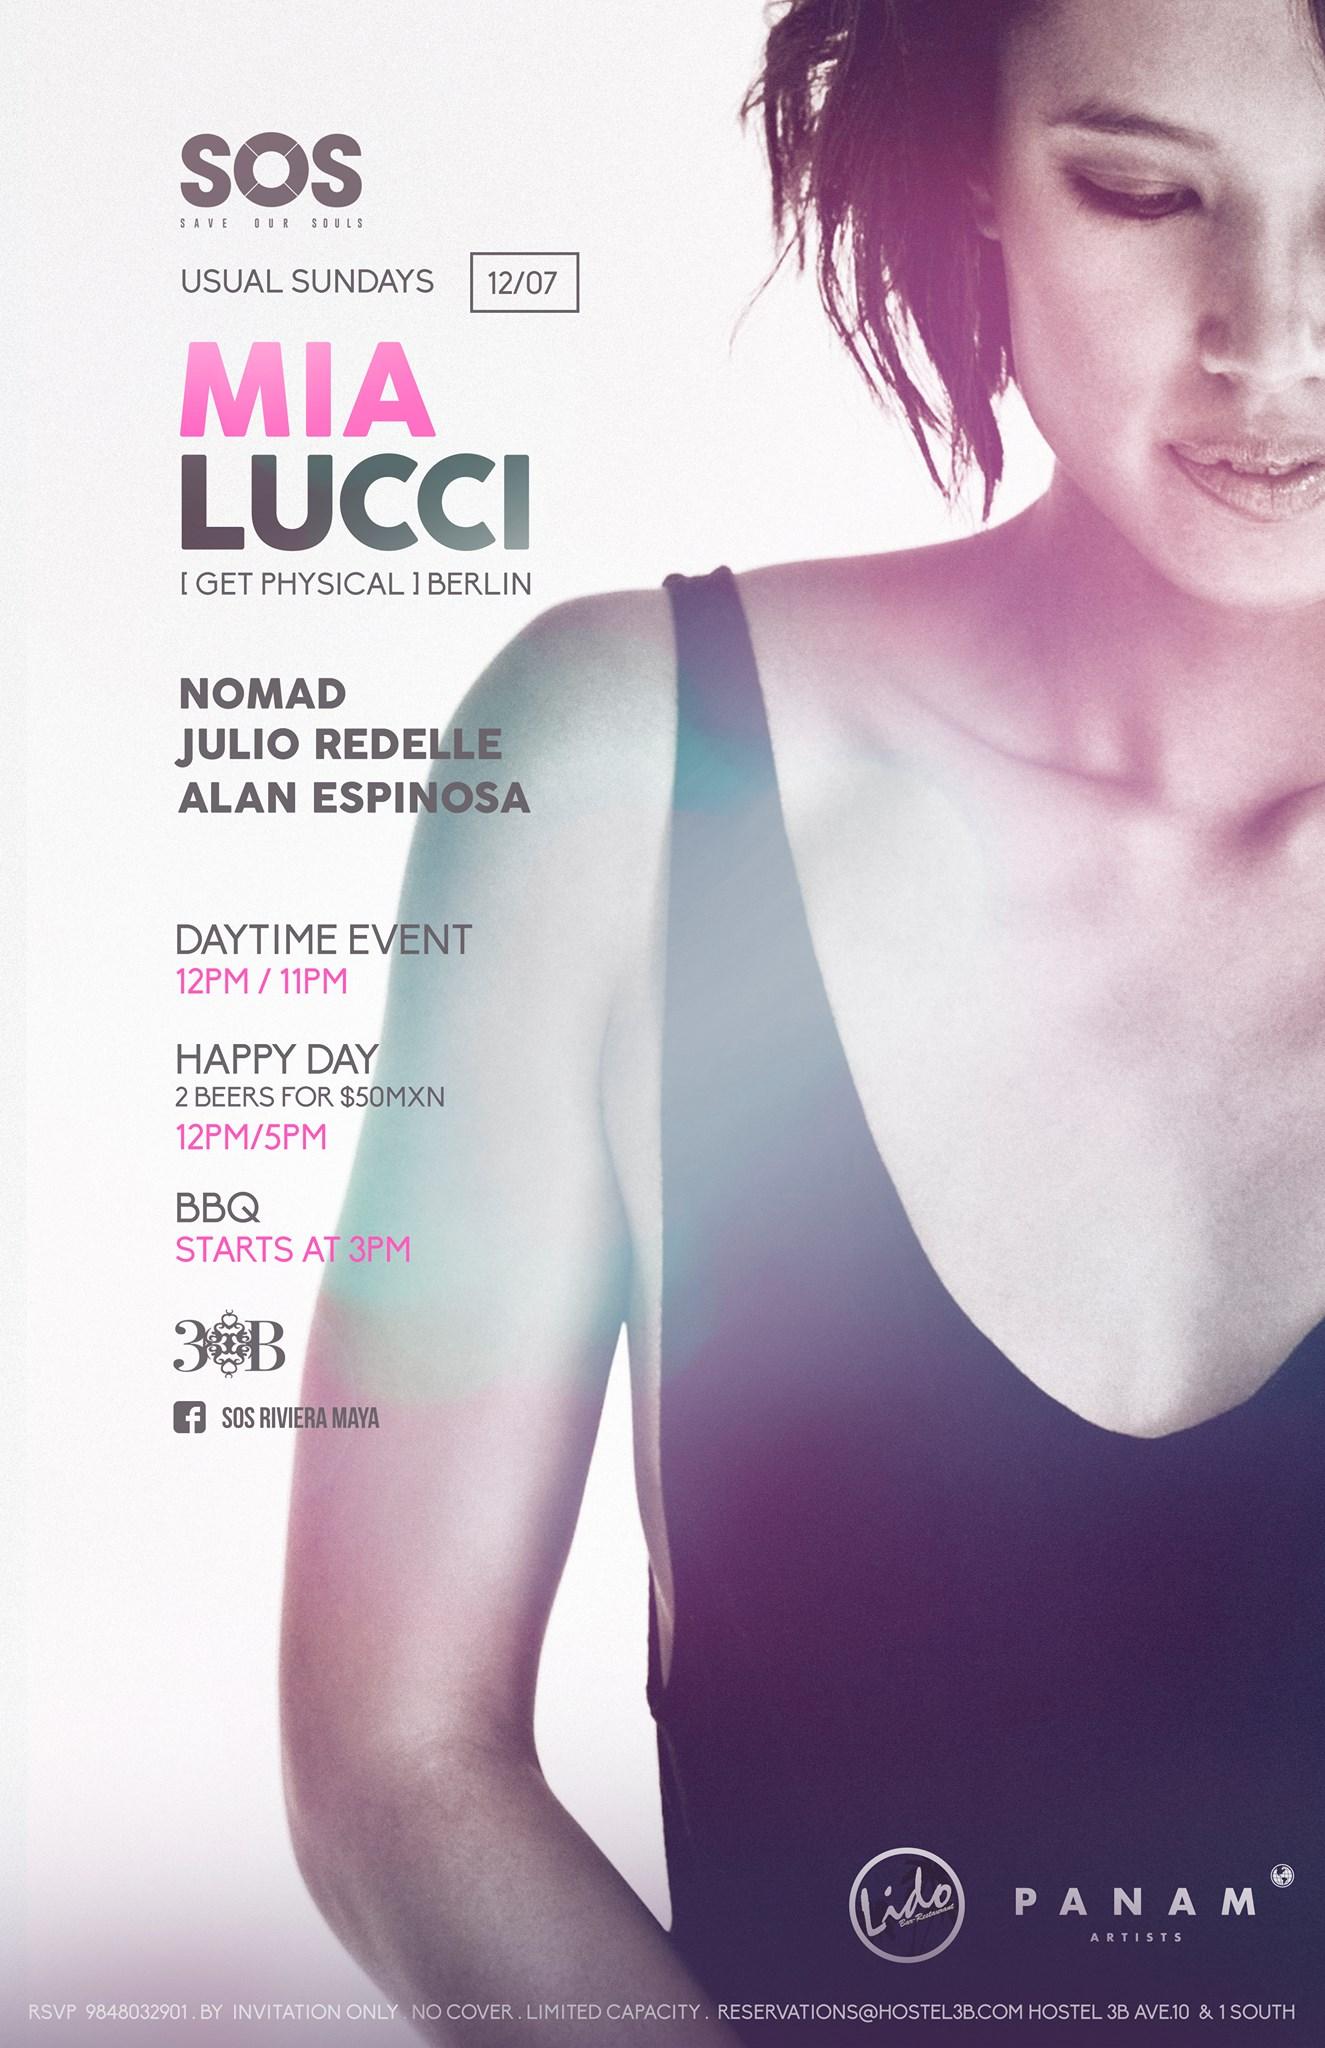 Mia lucci @ SOS Lounge - Playa del carmen